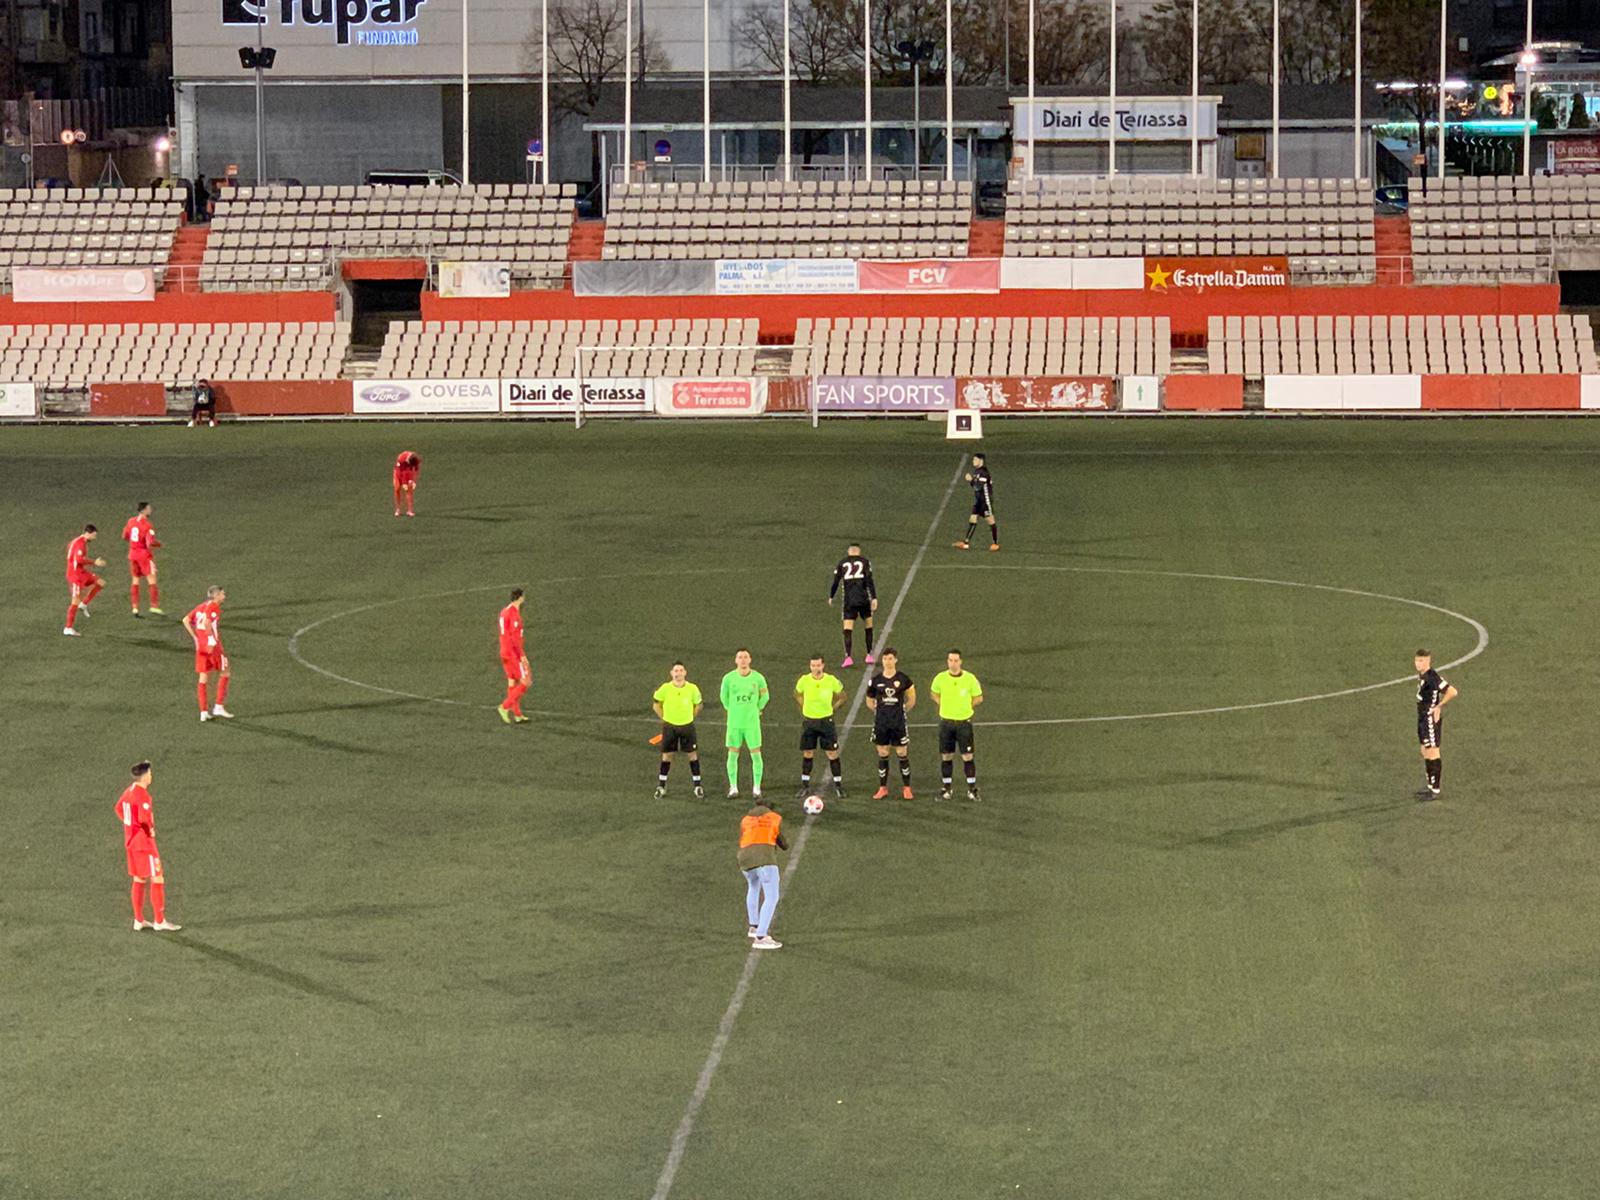 El CF Pobla de Mafumet perd 4-0 davant del Terrassa FC